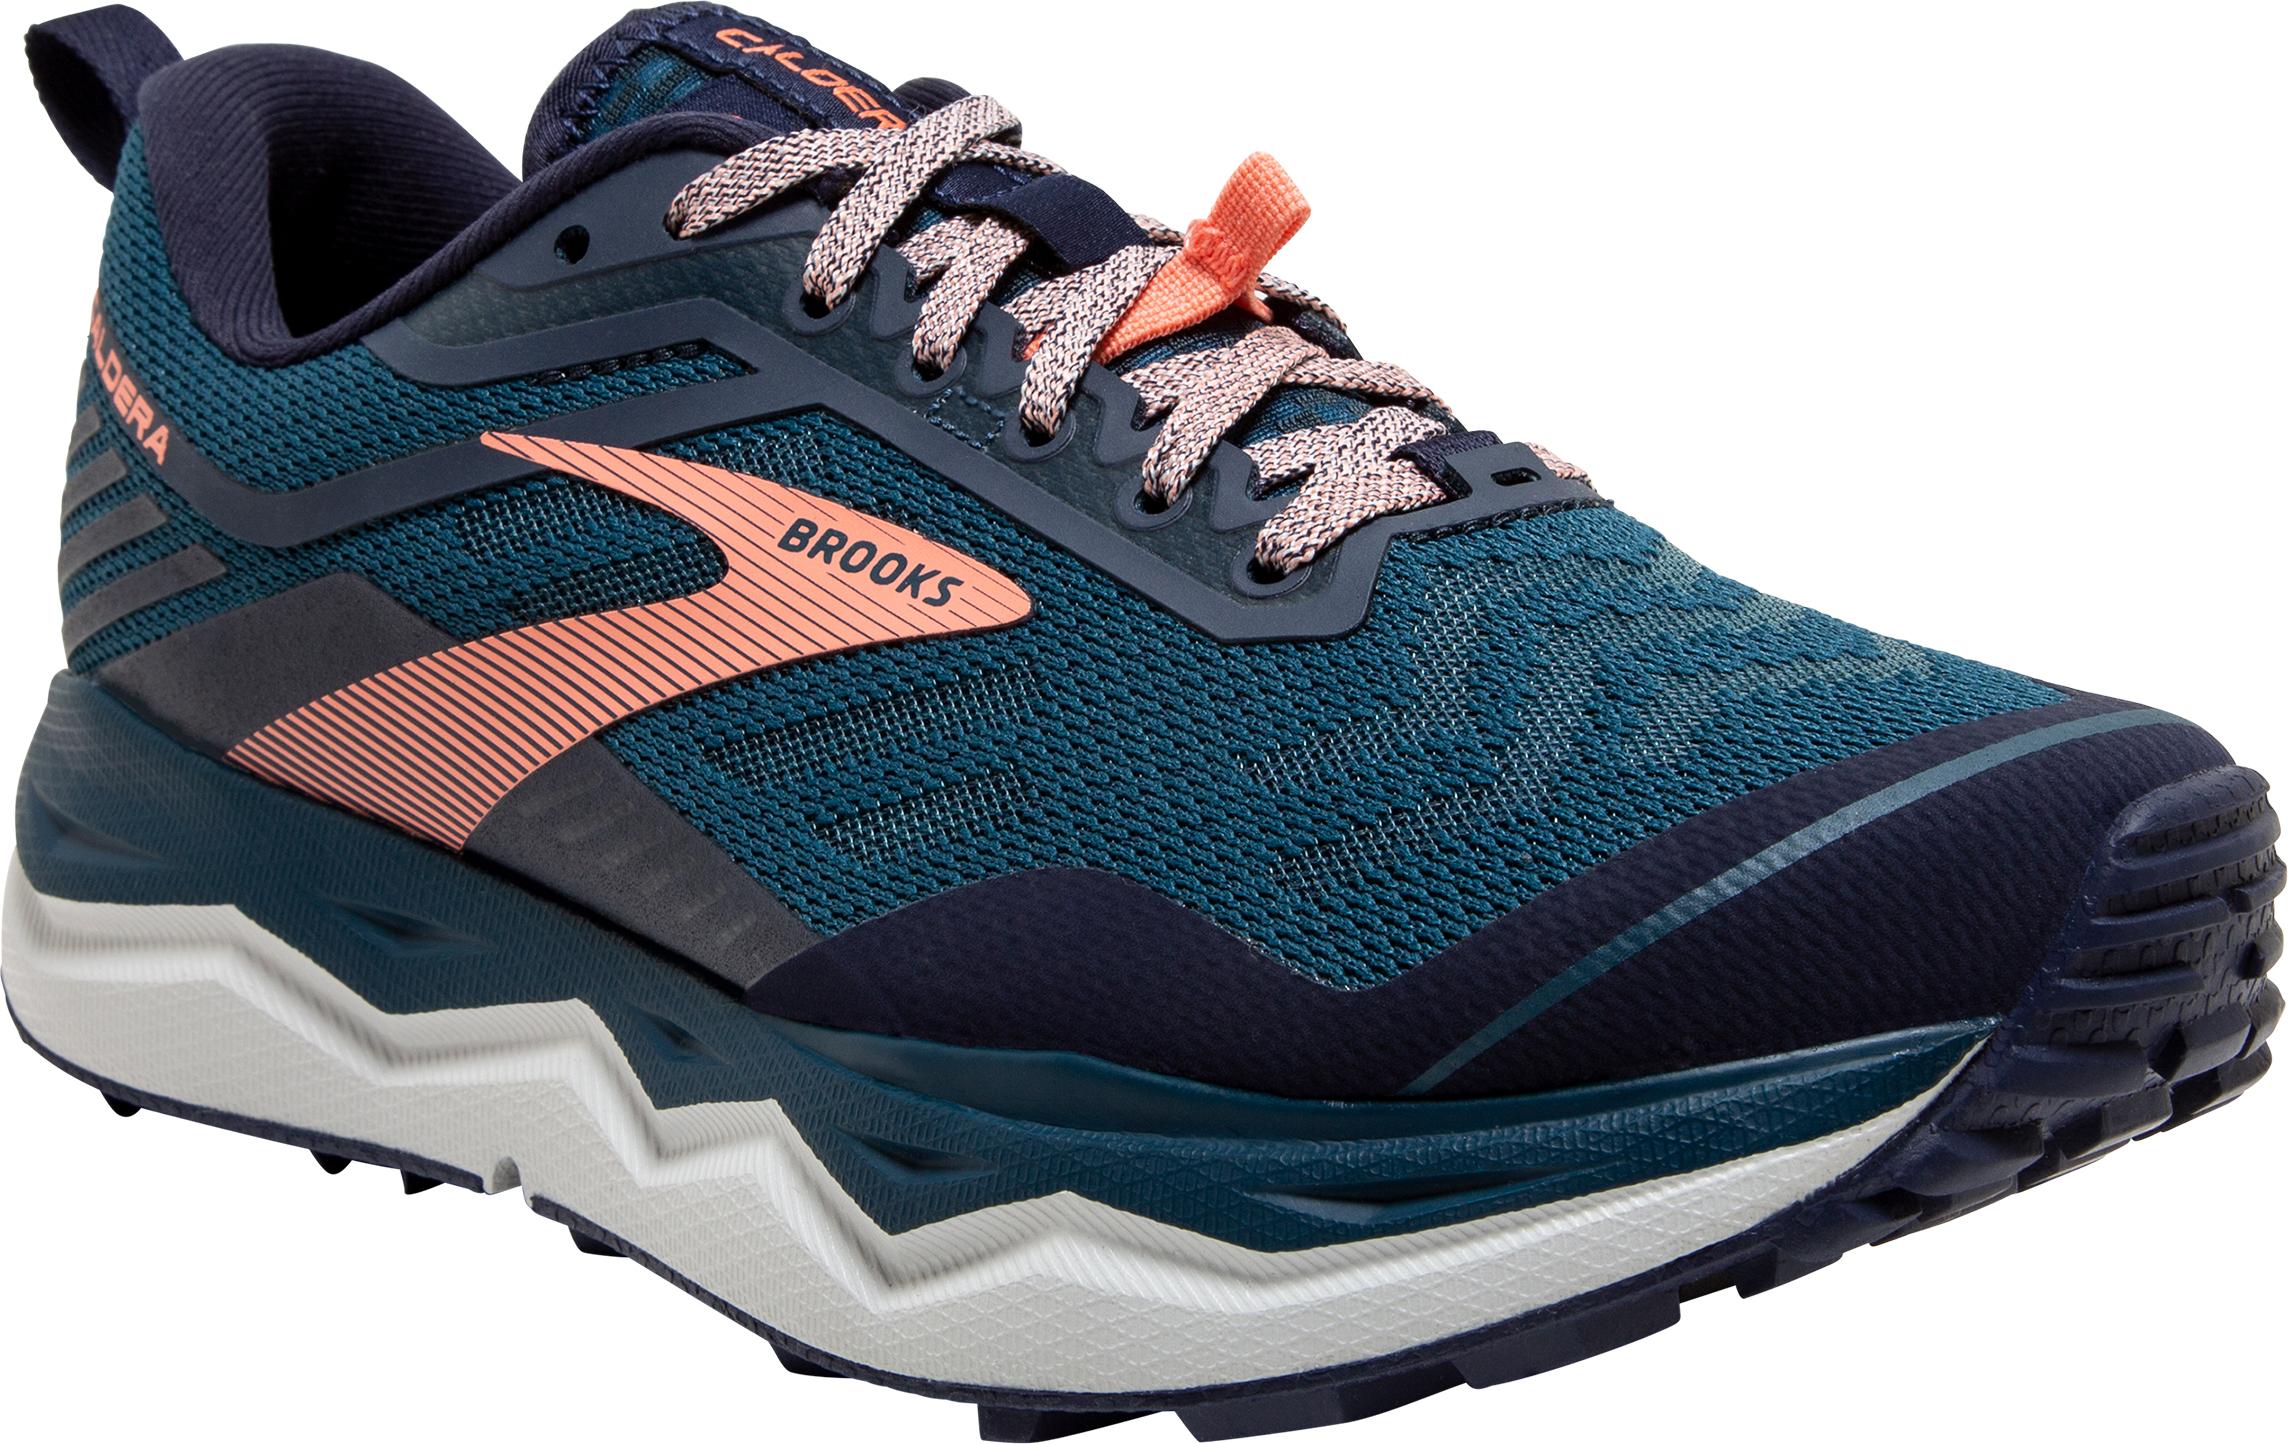 Brooks Caldera 4 Trail Running Shoes